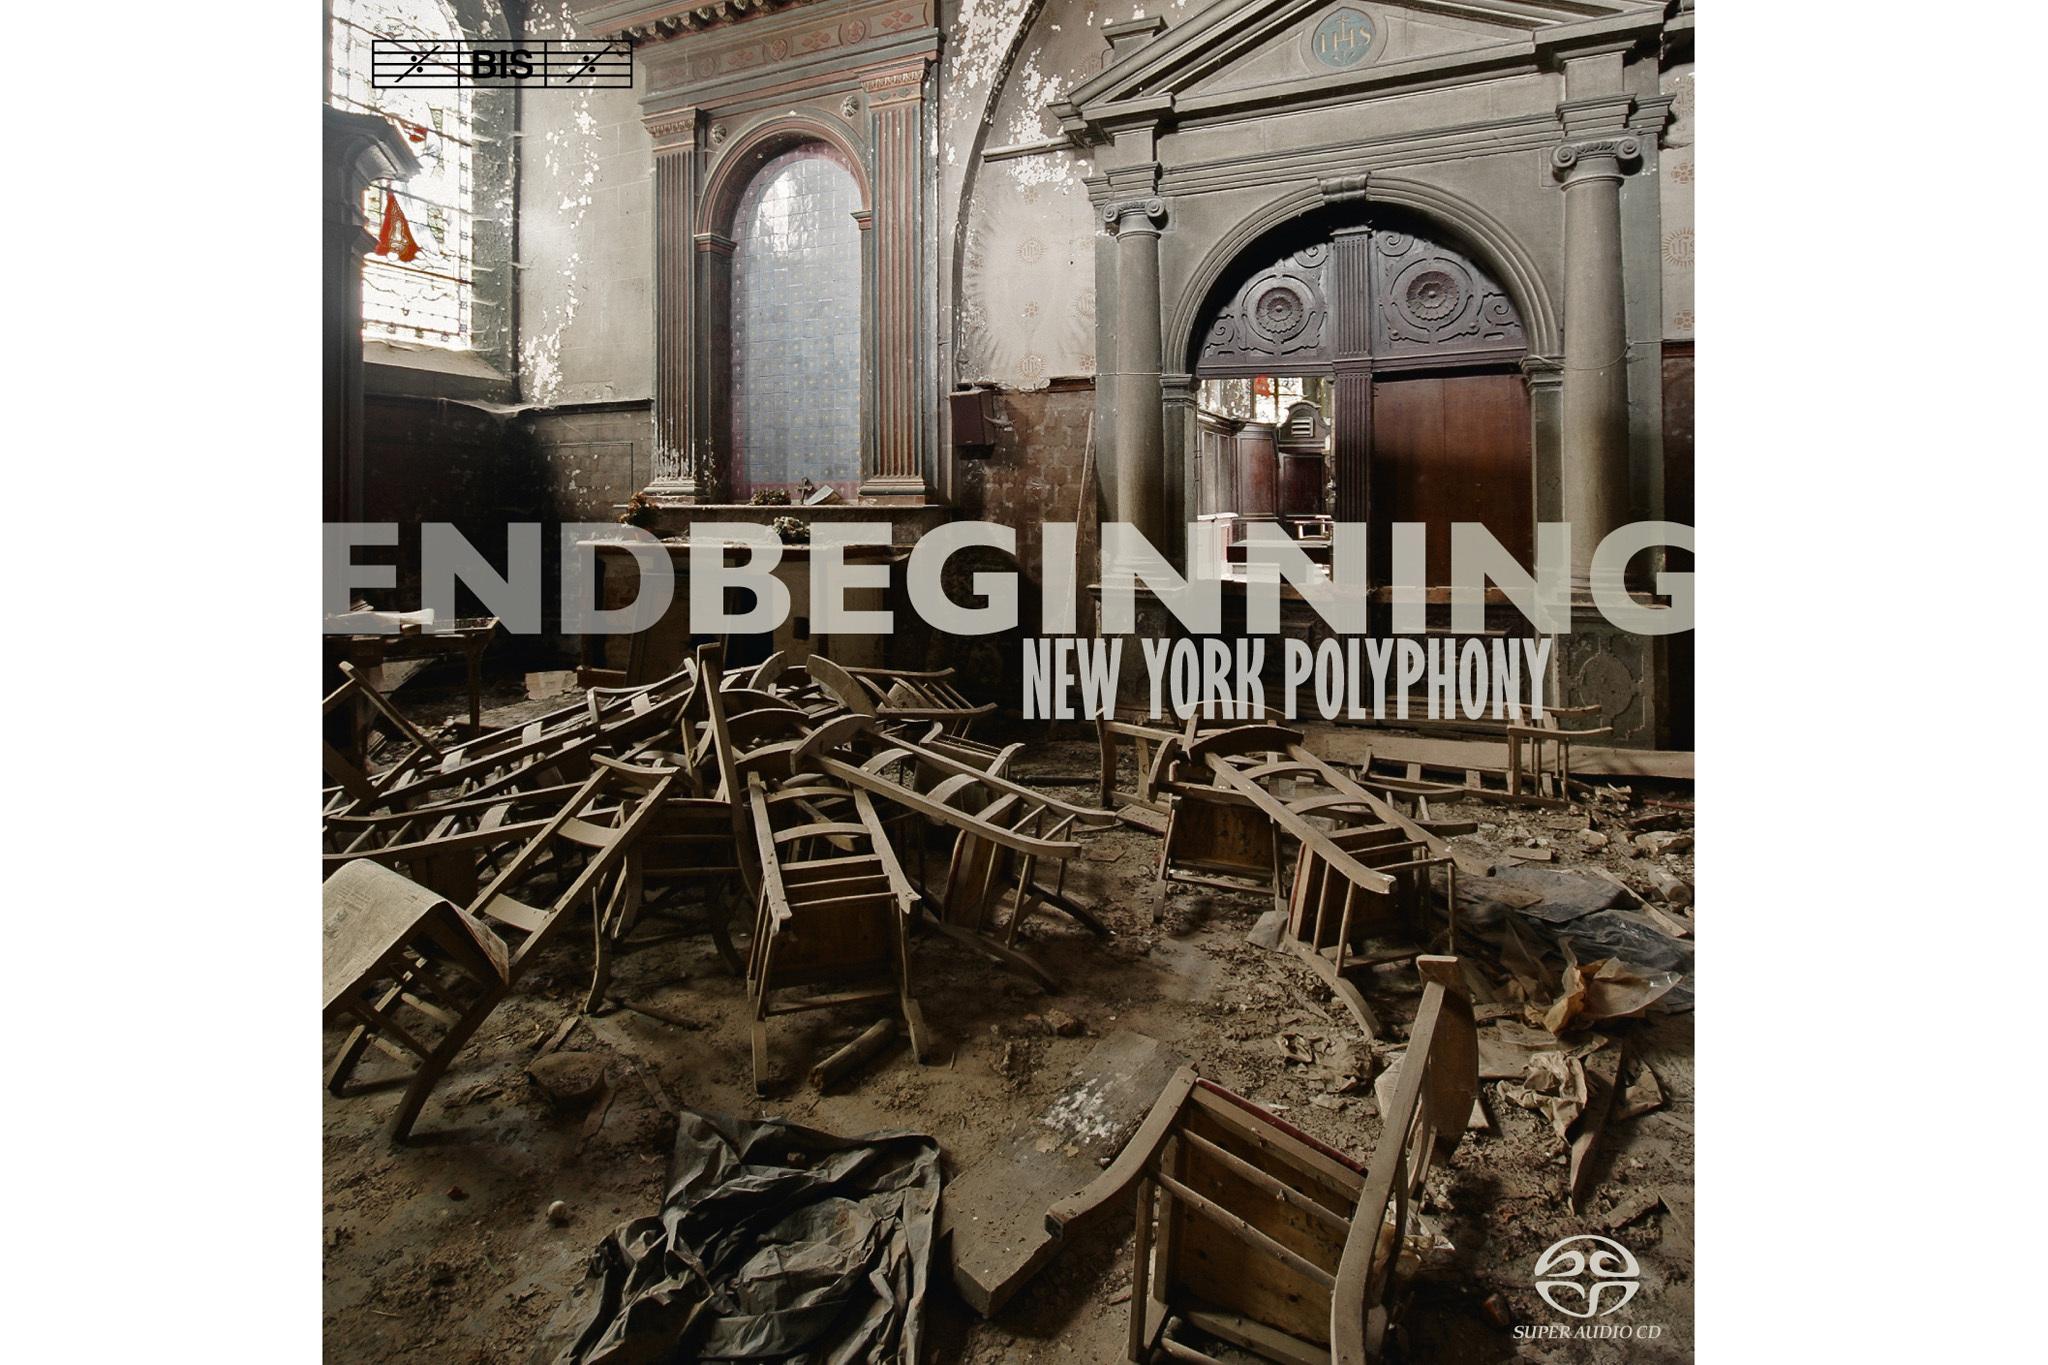 New York Polyphony, endBeginning (Bis)